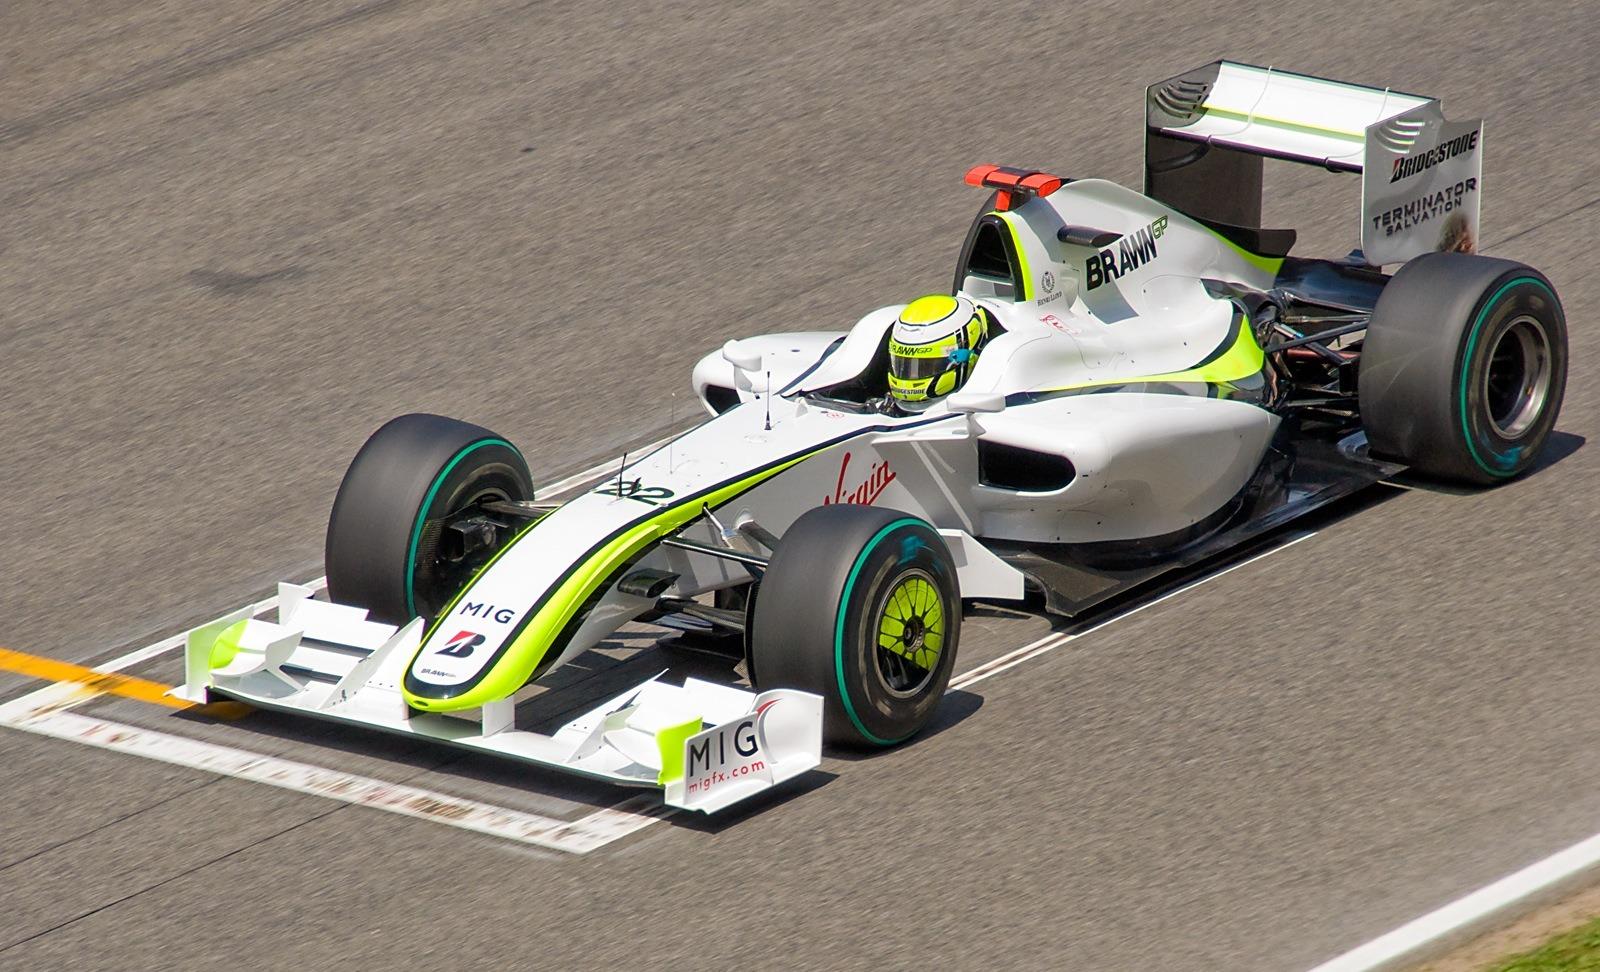 Great_F1_Designers_&_Engineers_-_designing_great_race-winning_cars